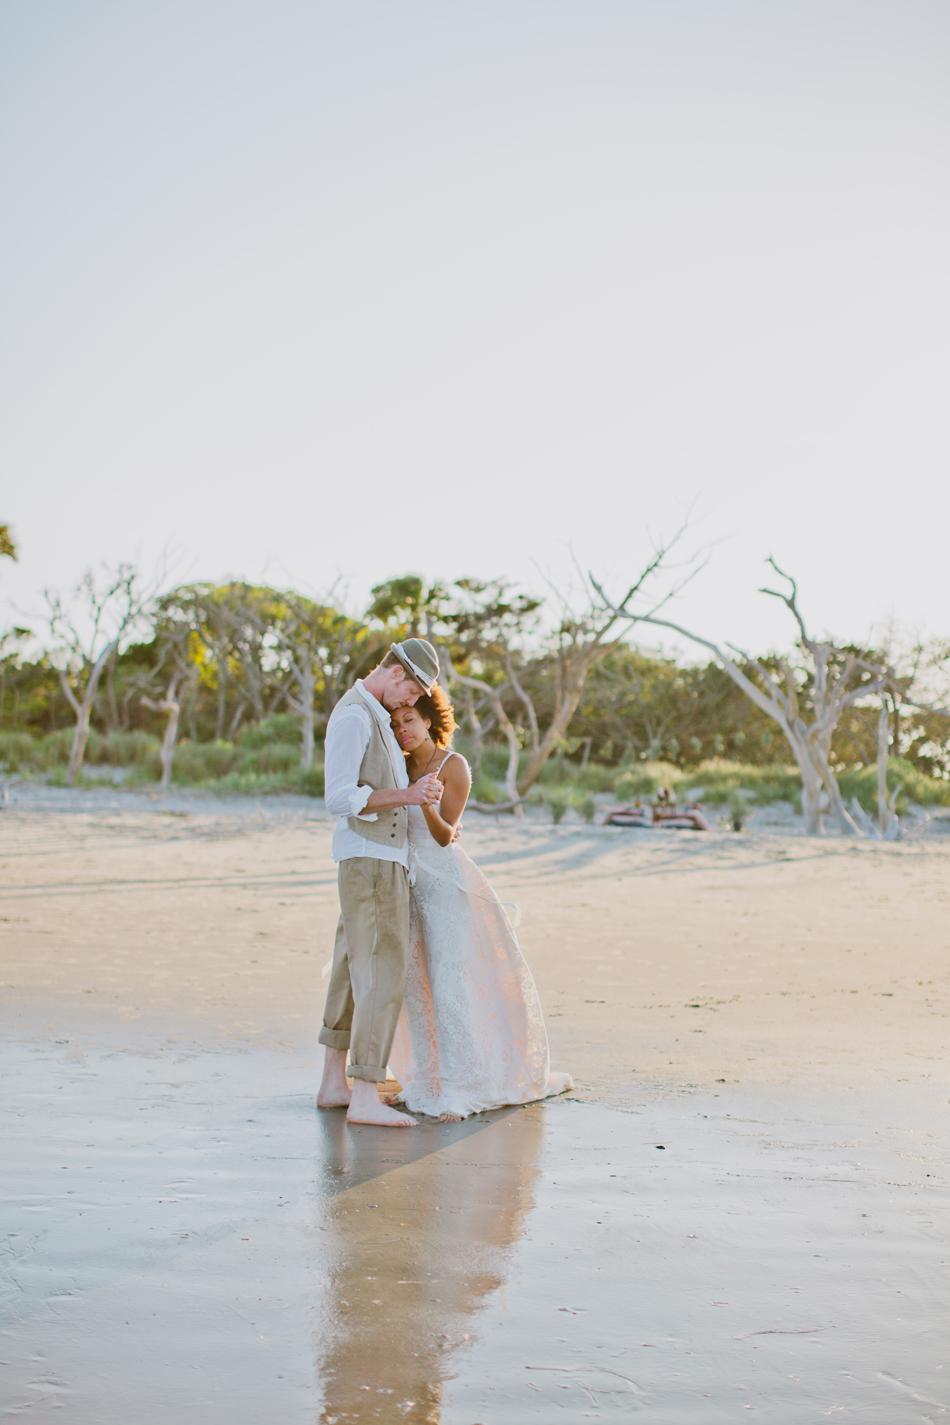 Jameykay_arlie_bohemian_elopement_styled_shoot042.jpg